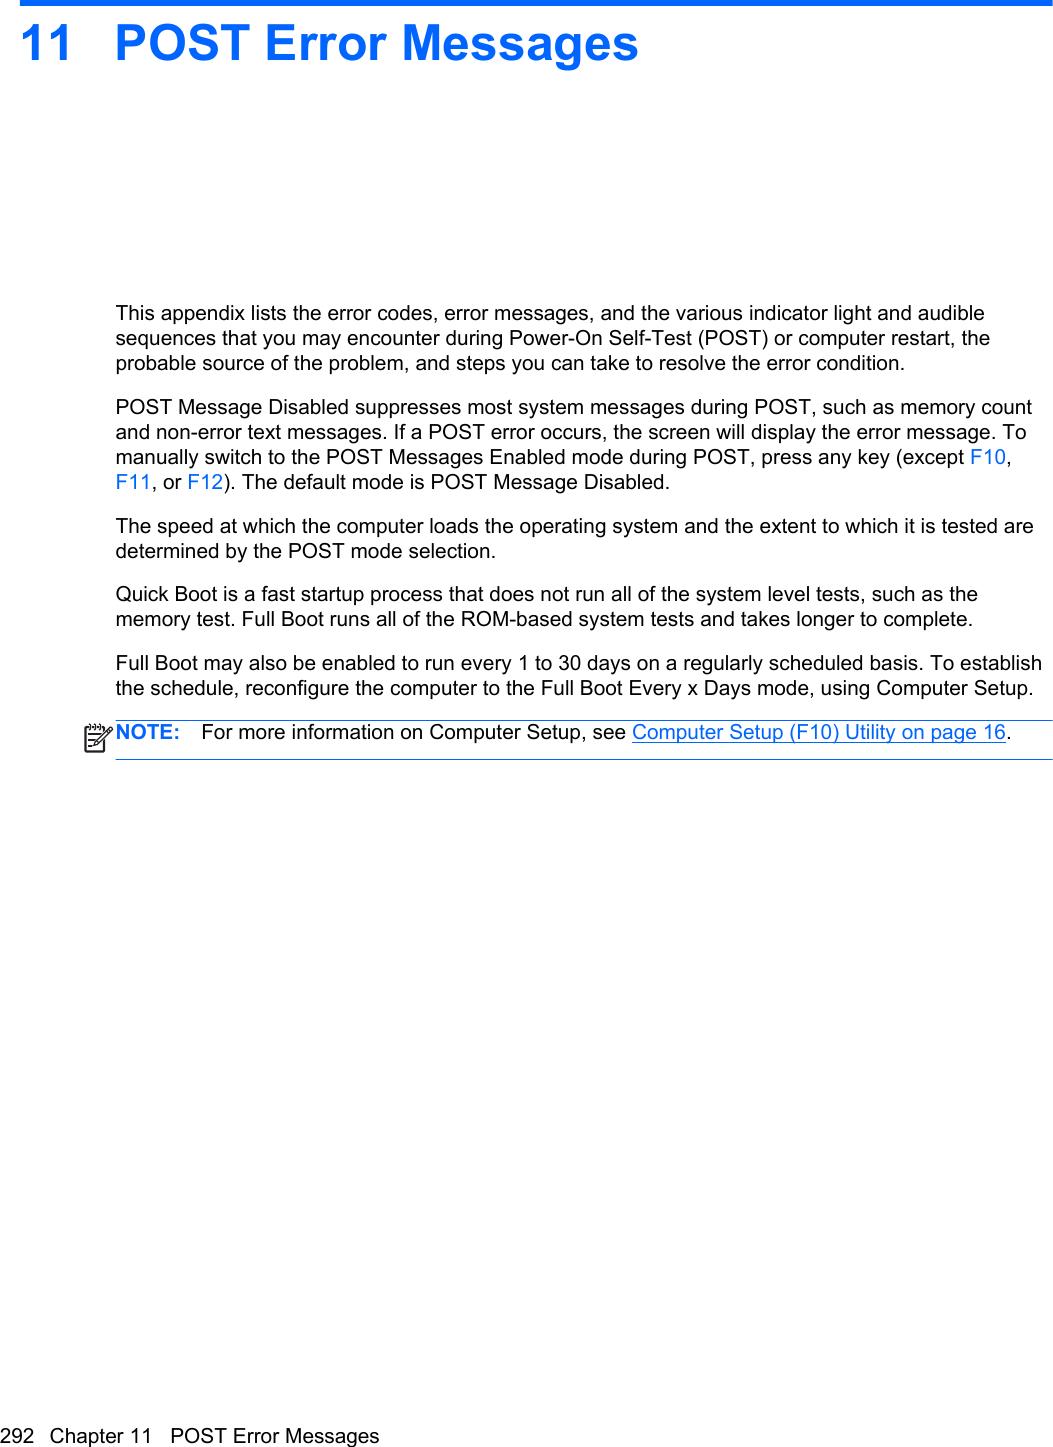 Hp Hewlett Packard Compaq Elite 8300 Qv997Av Users Manual